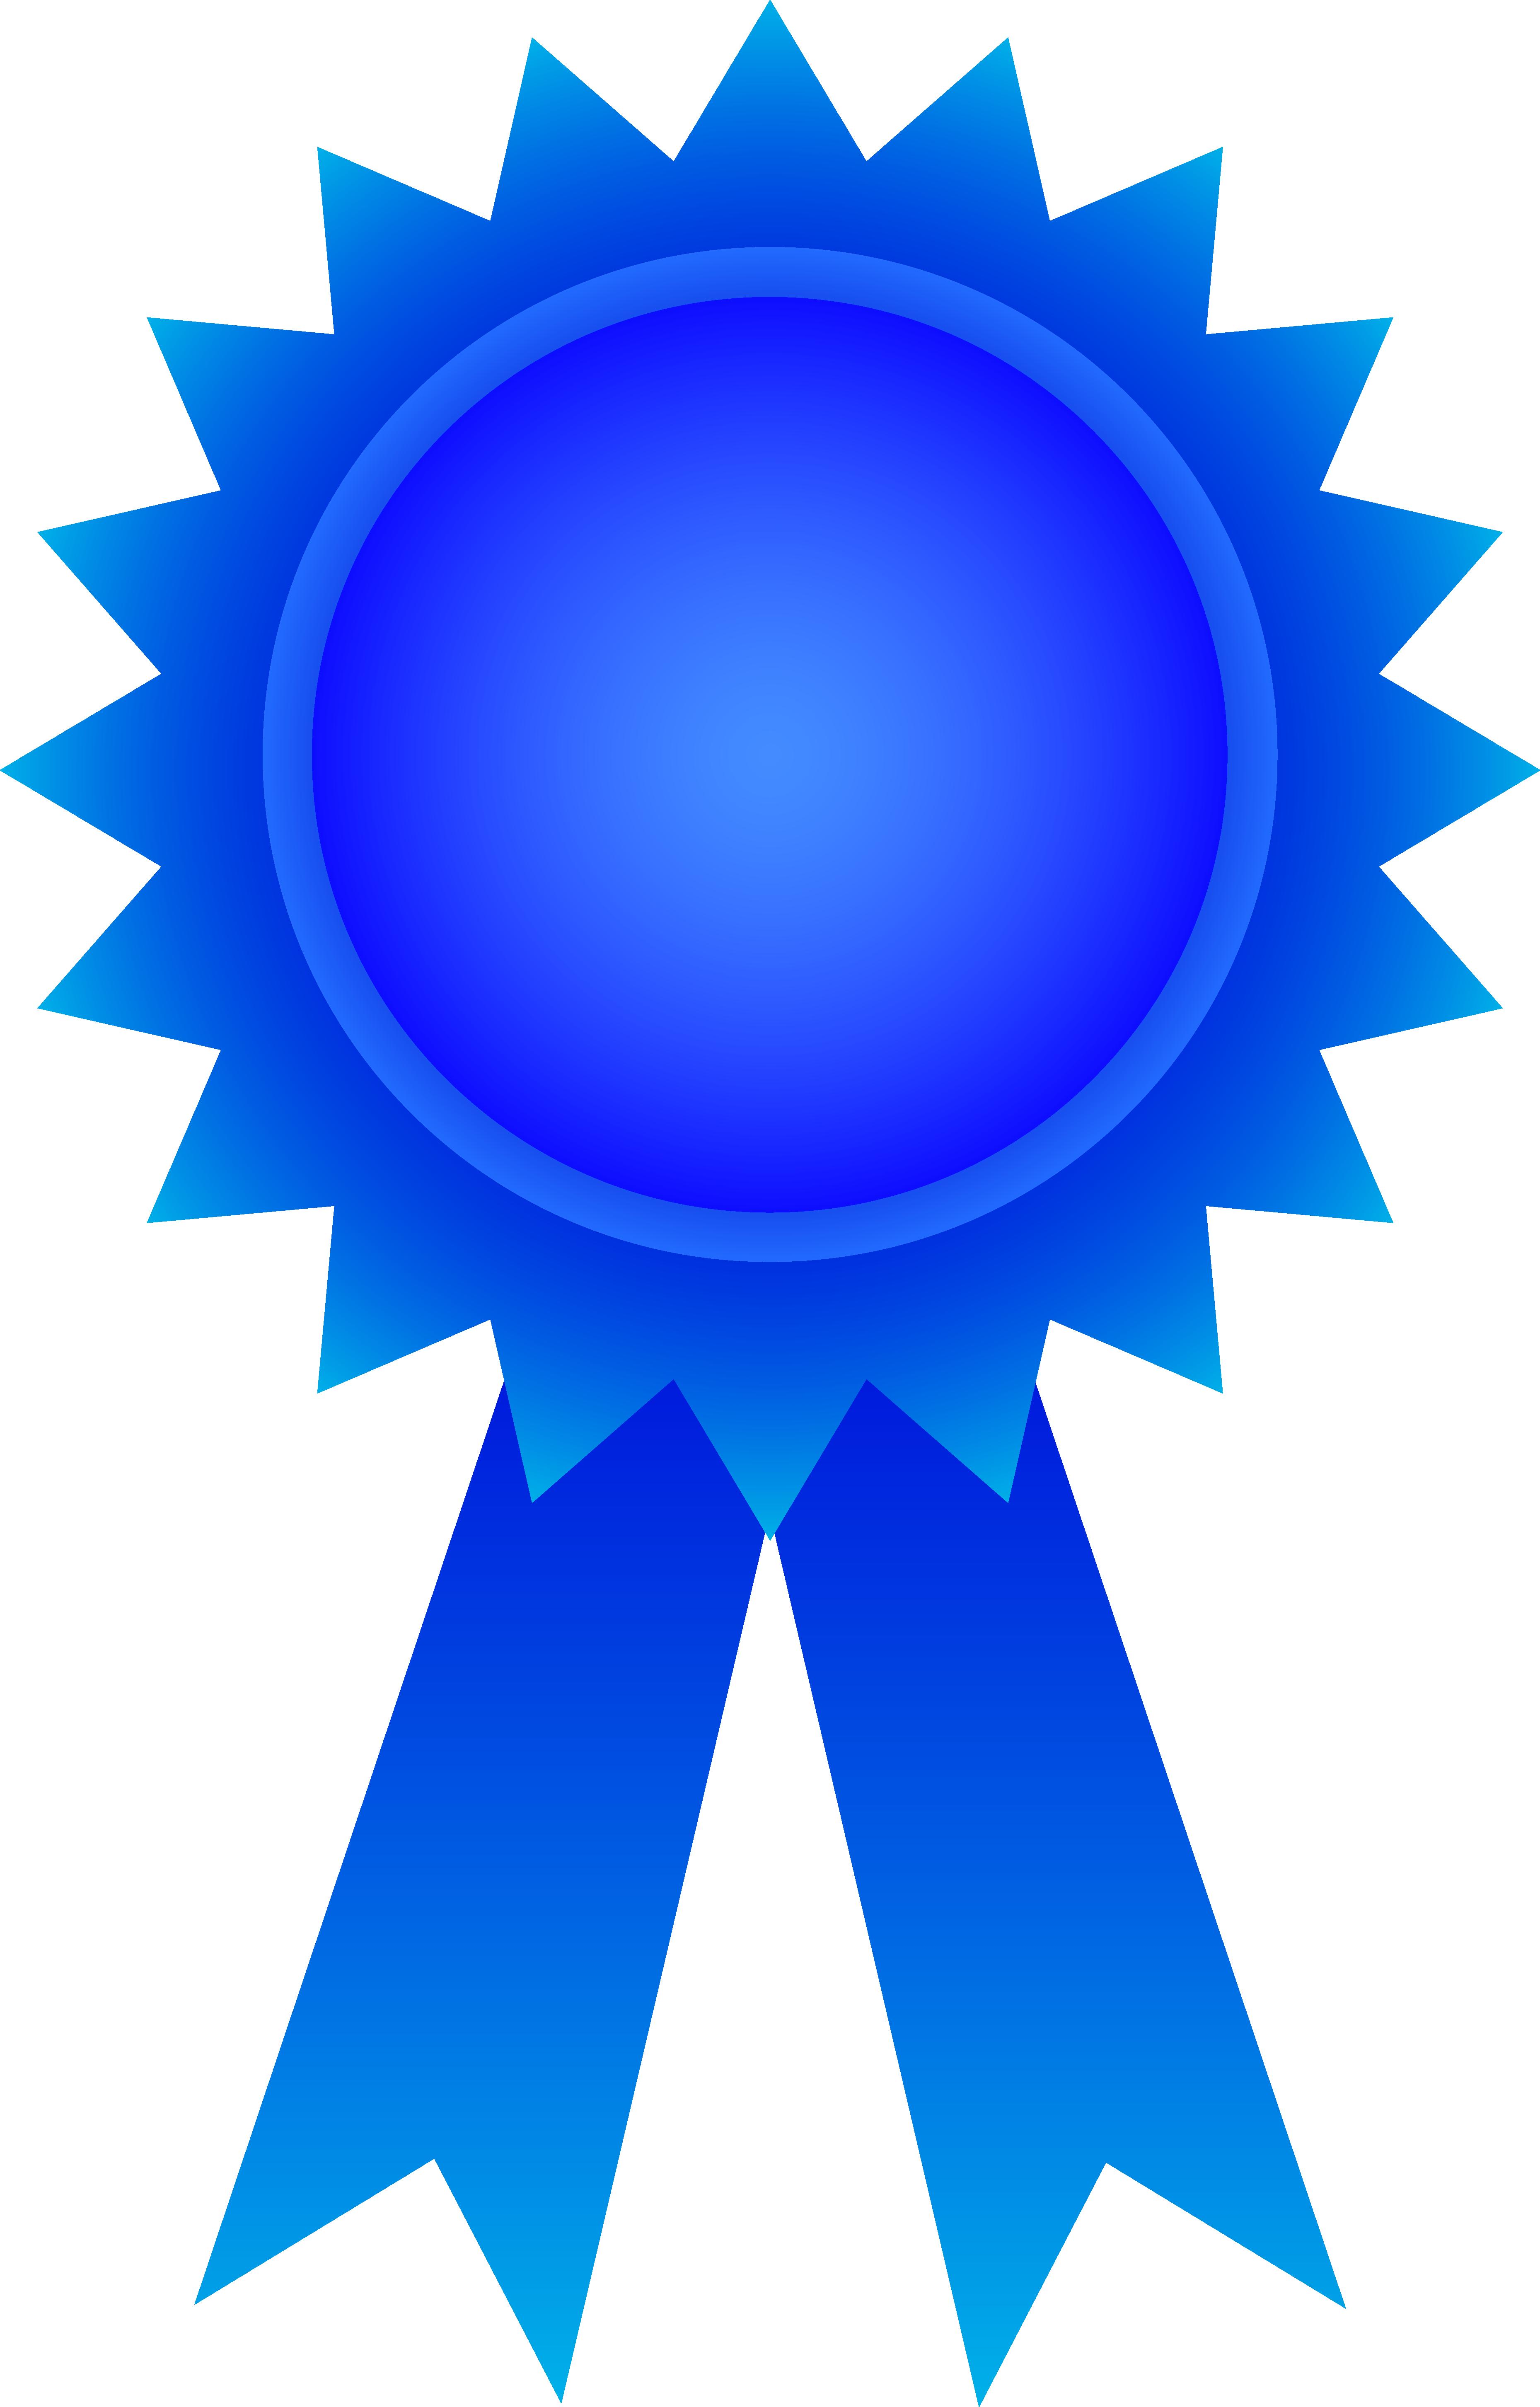 Award ribbon clipart jpg free download Free Award Ribbon Cliparts, Download Free Clip Art, Free Clip Art on ... jpg free download